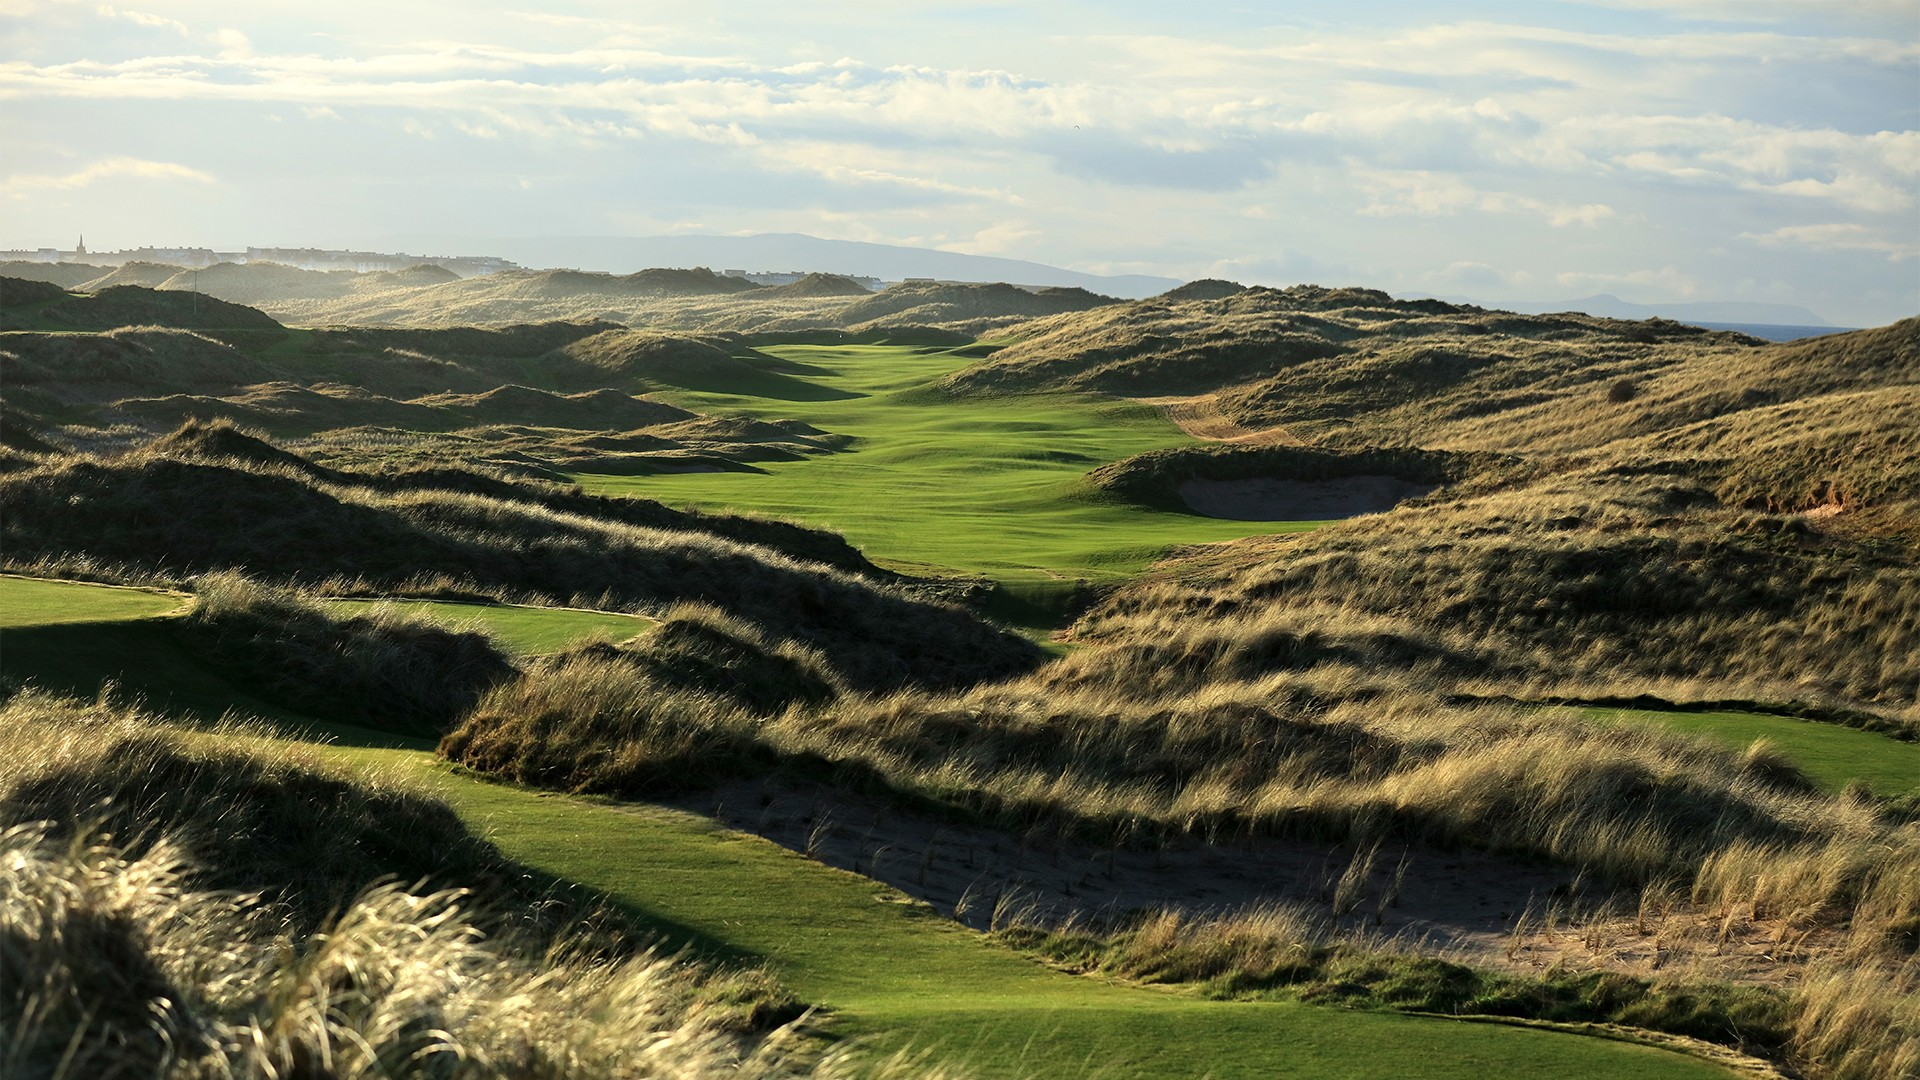 Royal Portrush, 7th hole, Dunluce Links golf course